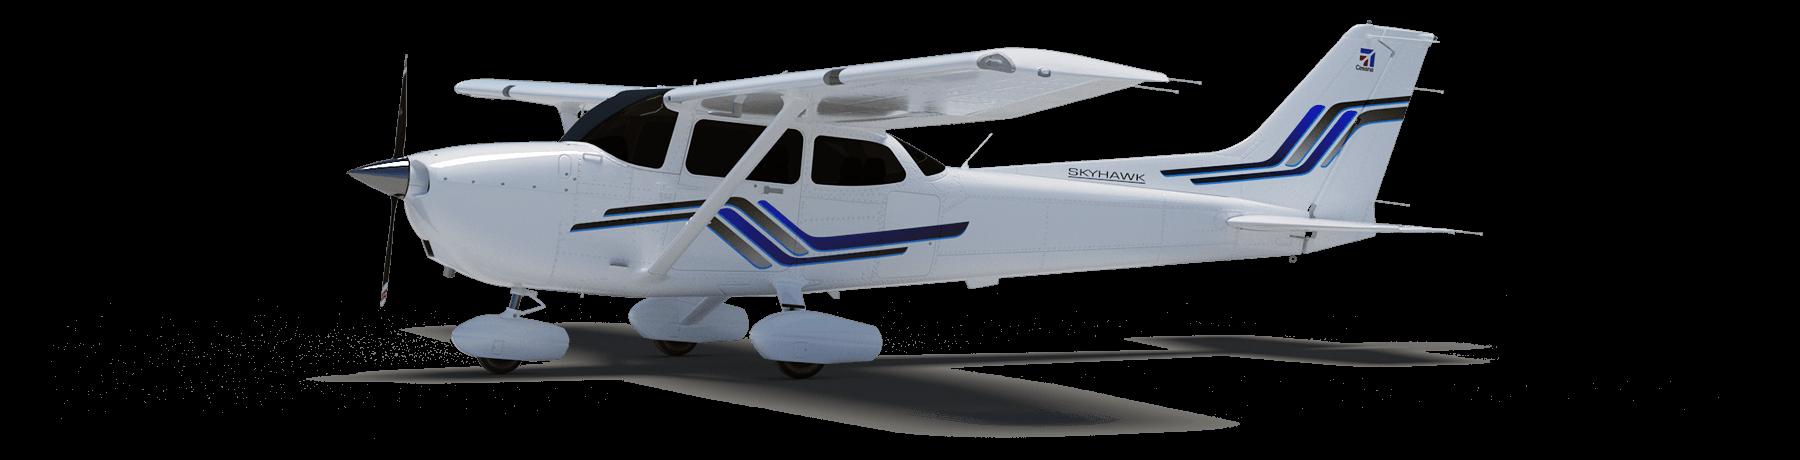 Cessna 172 Skyhawk. (Photo: Cessna)